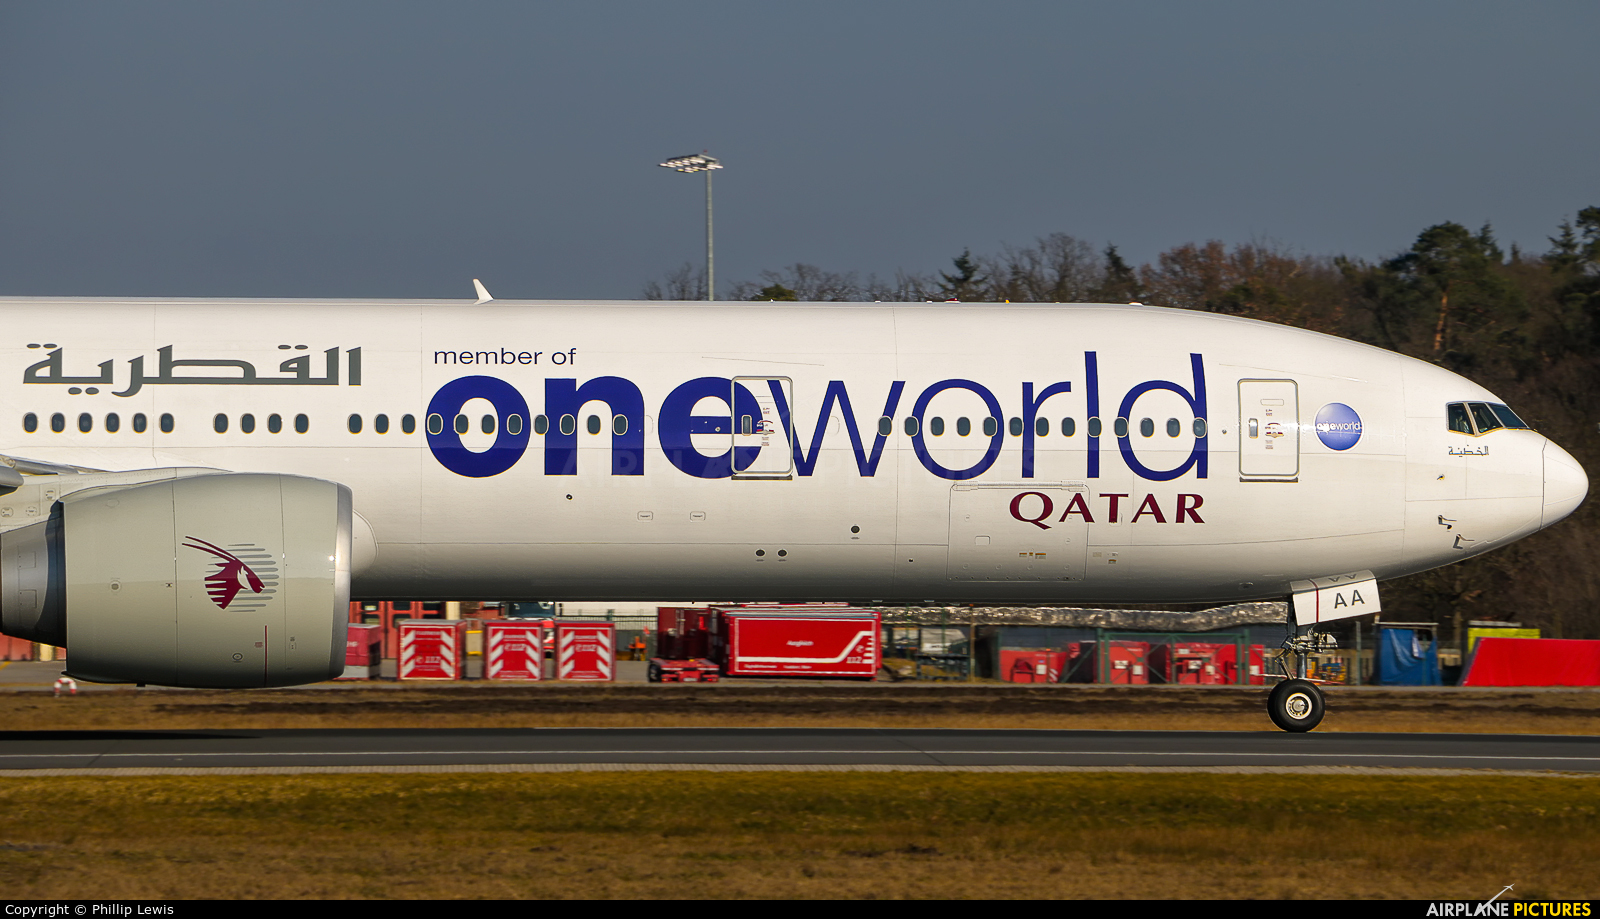 Qatar Airways A7-BAA aircraft at Frankfurt